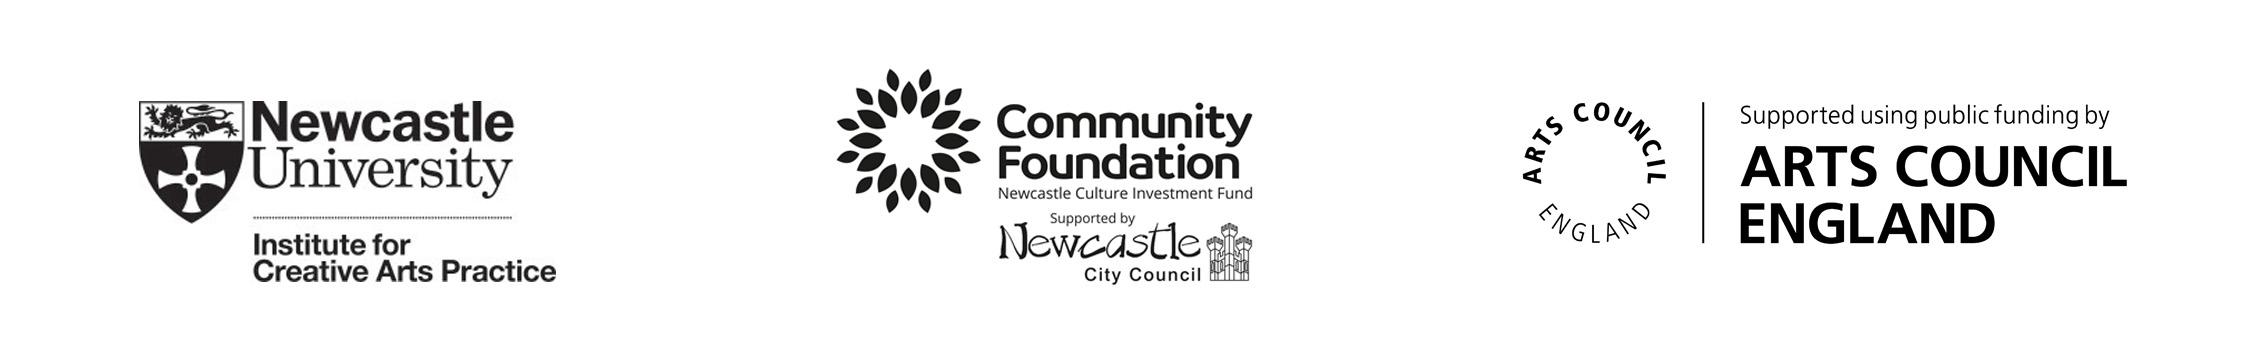 logo-banner-2018-19_image